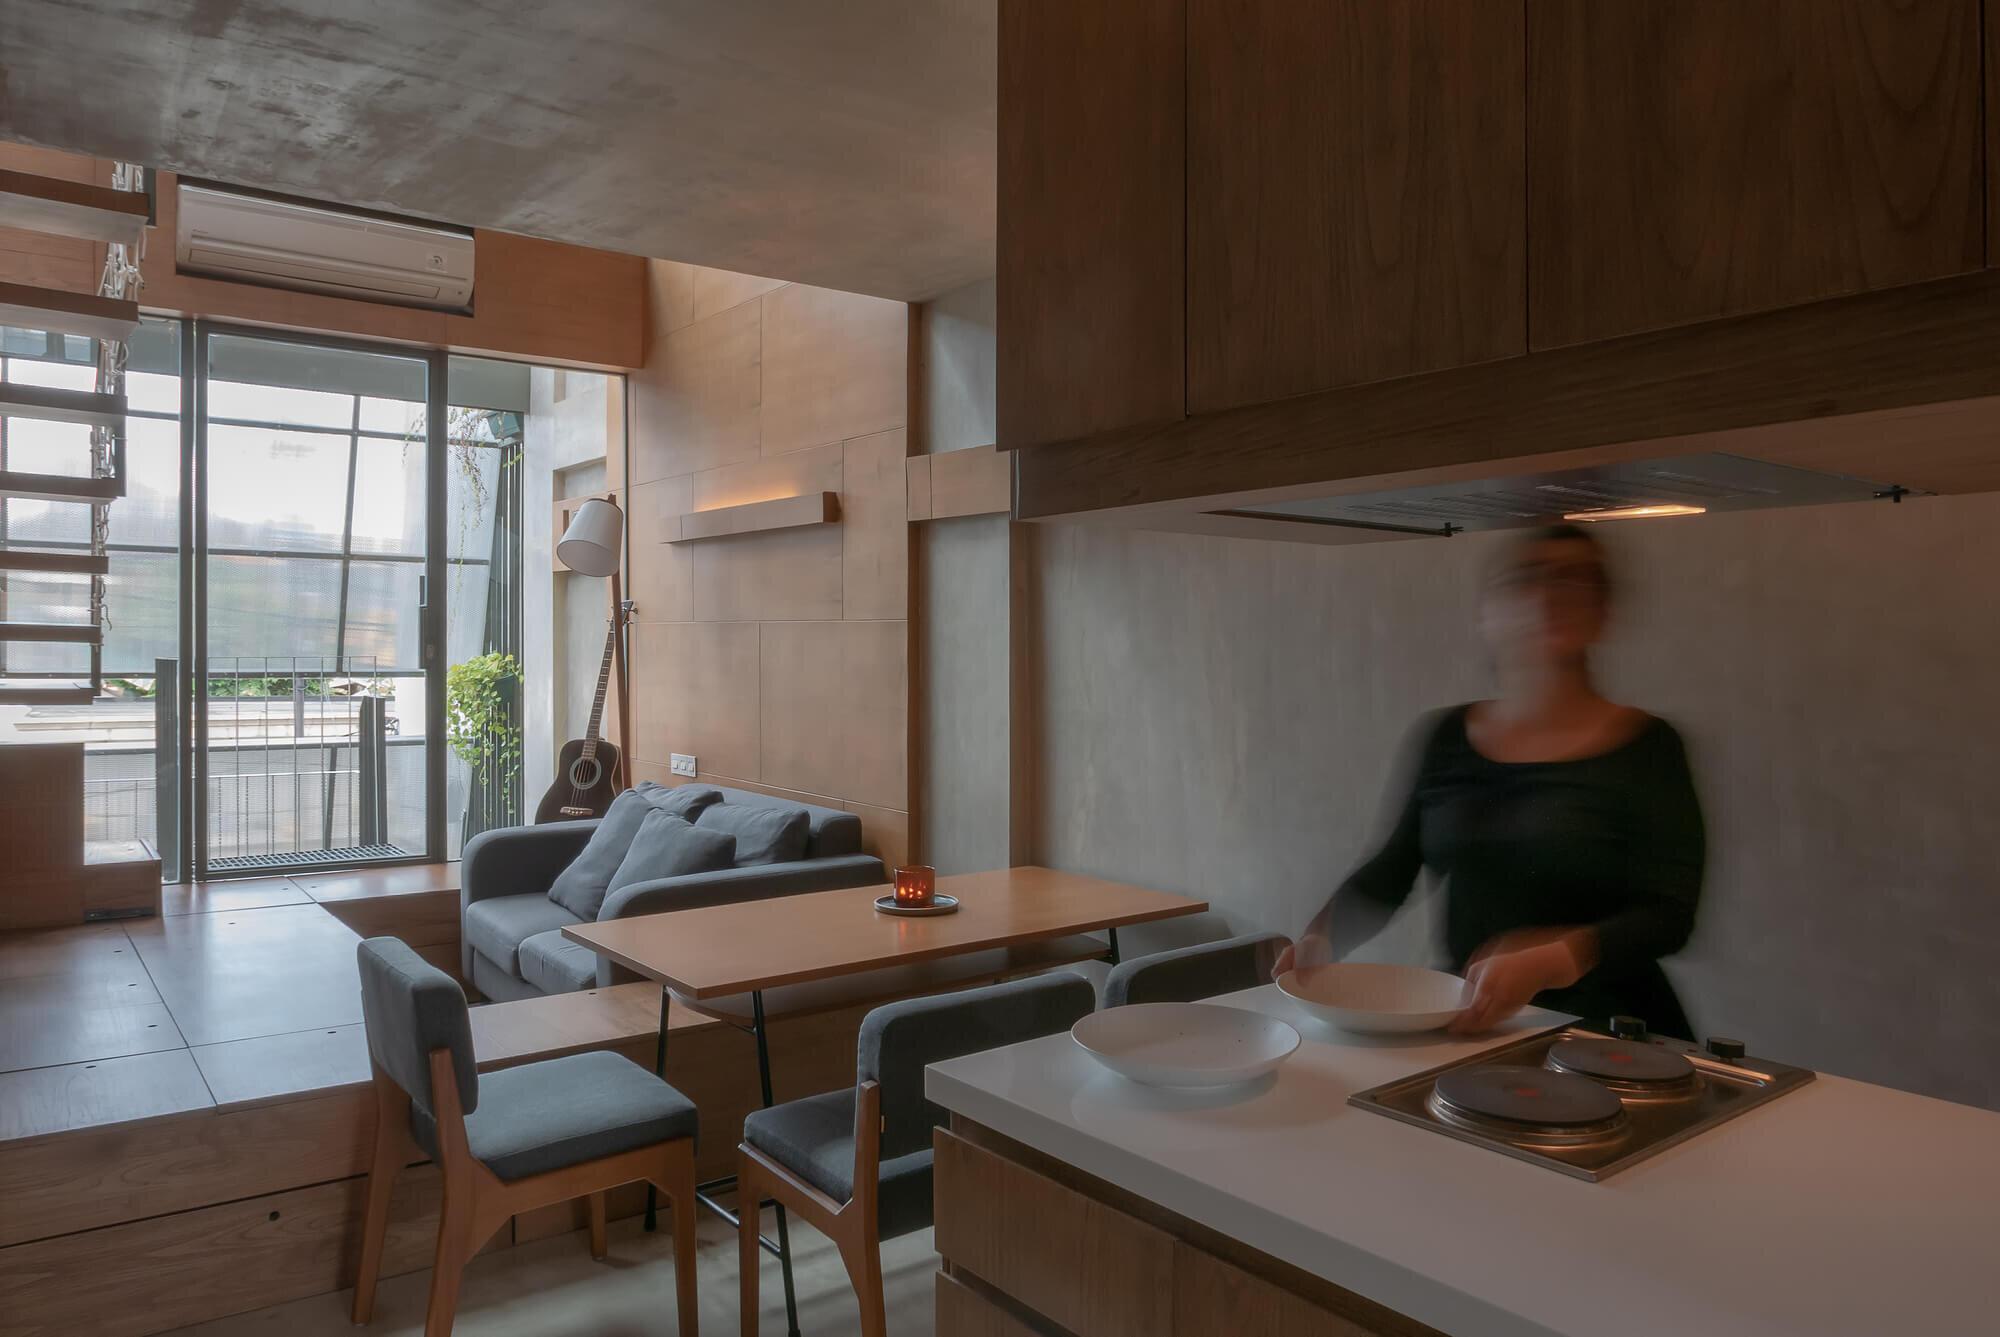 3500-Millimetre-House-Ago-Architects-Indonesia-12